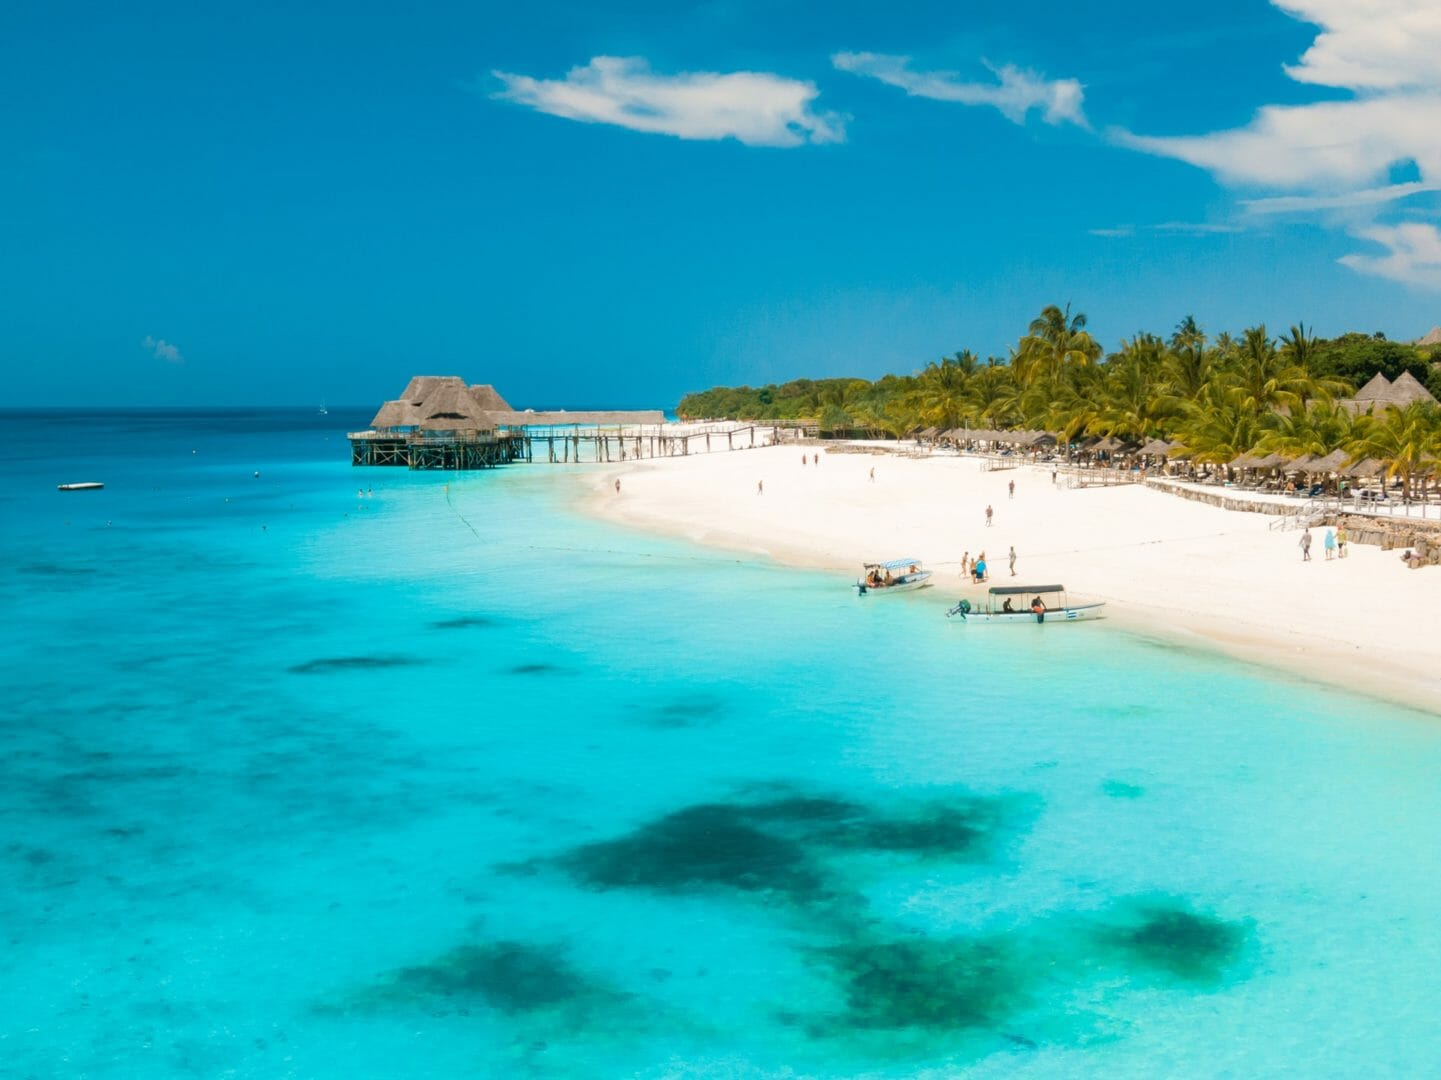 Vacances balnéaires en été au Zanzibar